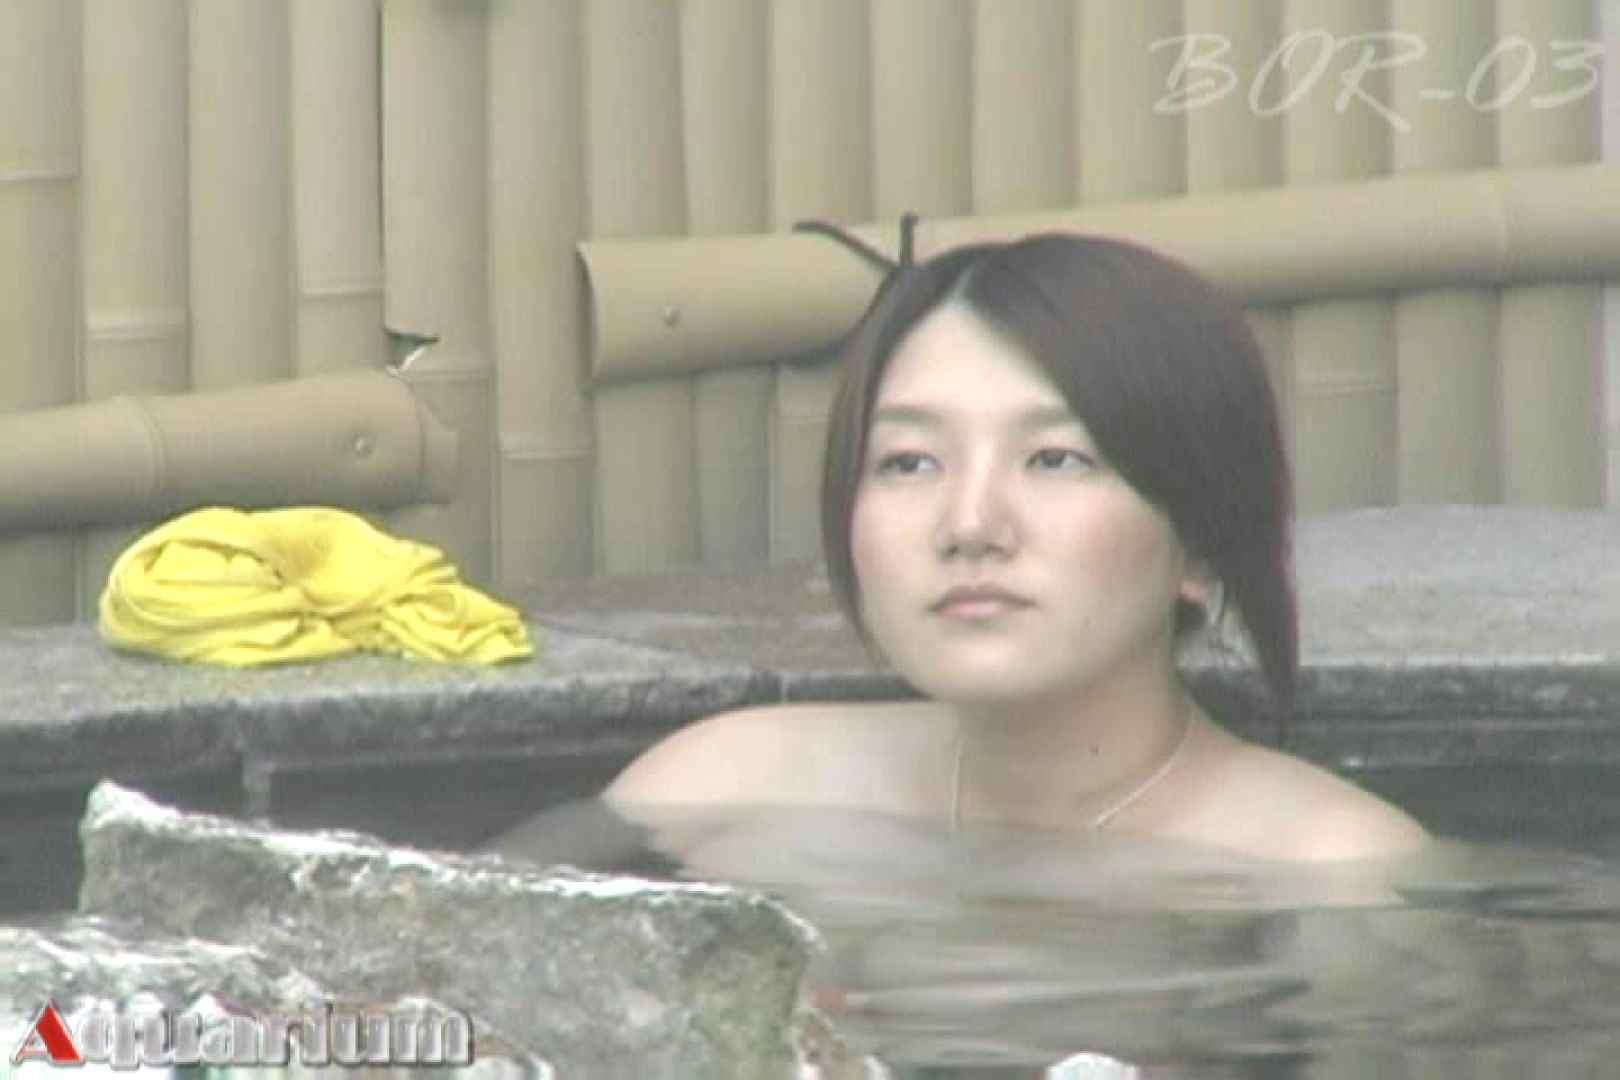 Aquaな露天風呂Vol.487 0 | 0  73連発 37